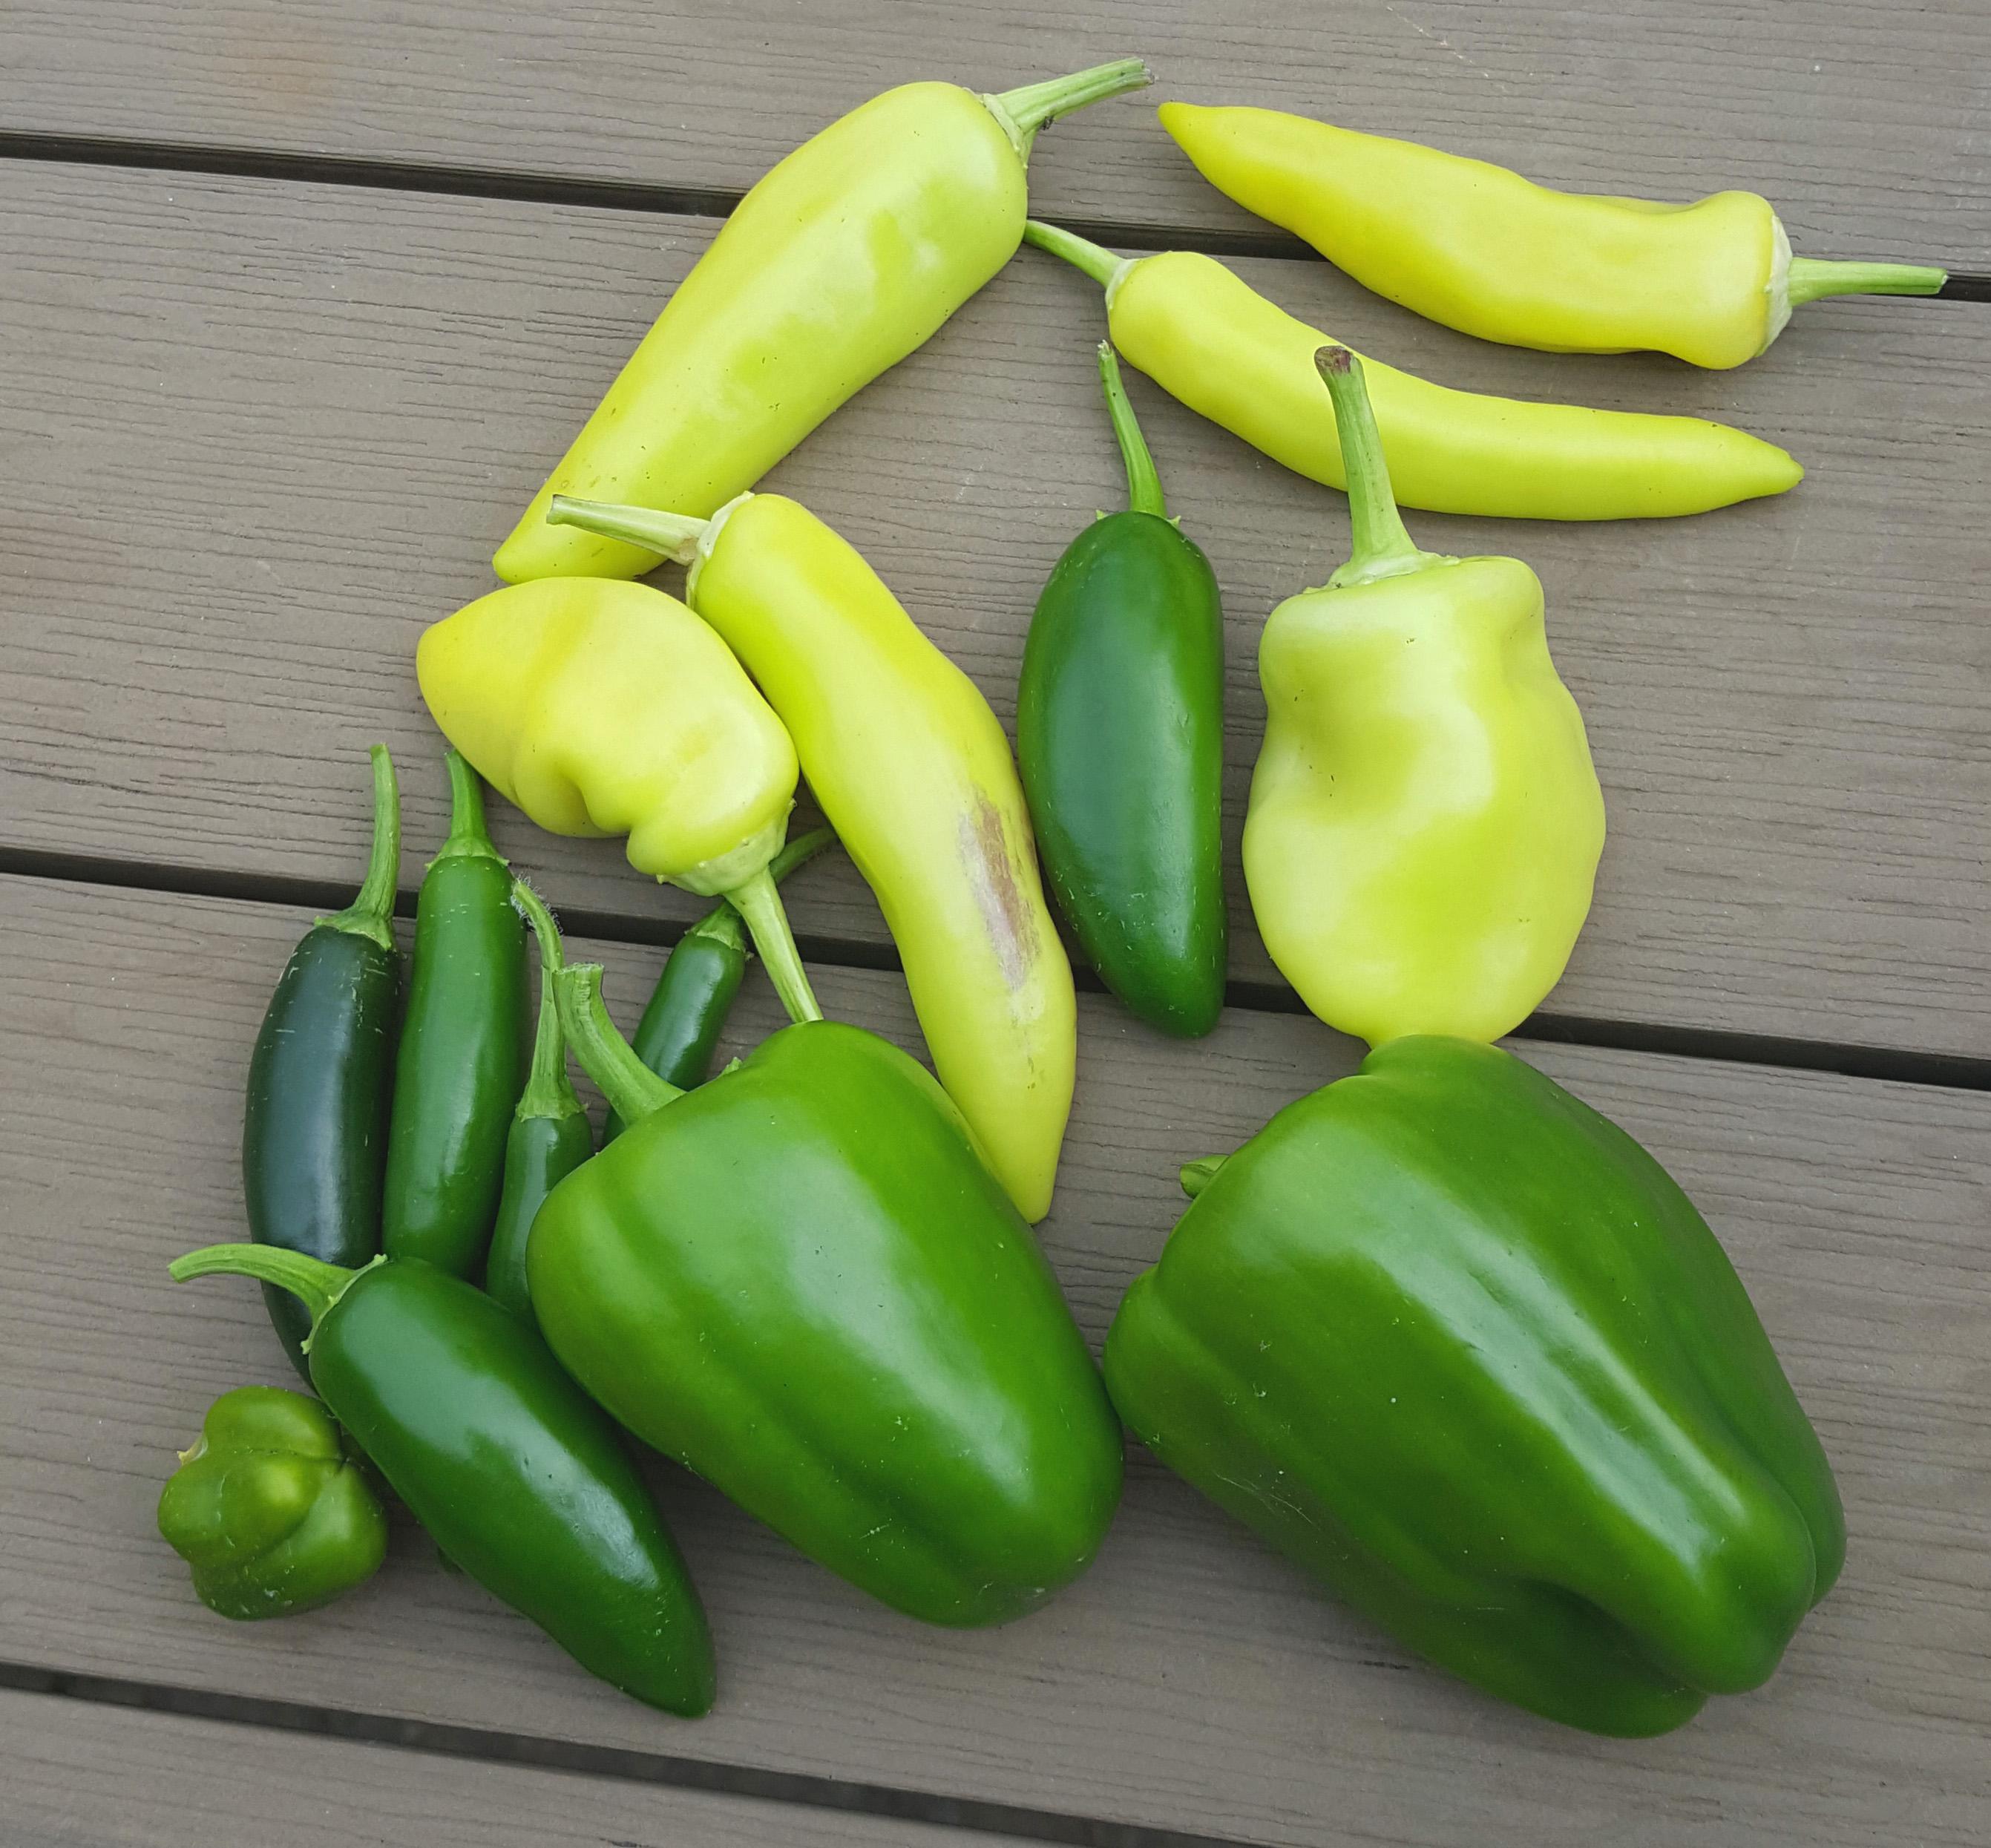 Backyard Peppers Harvest